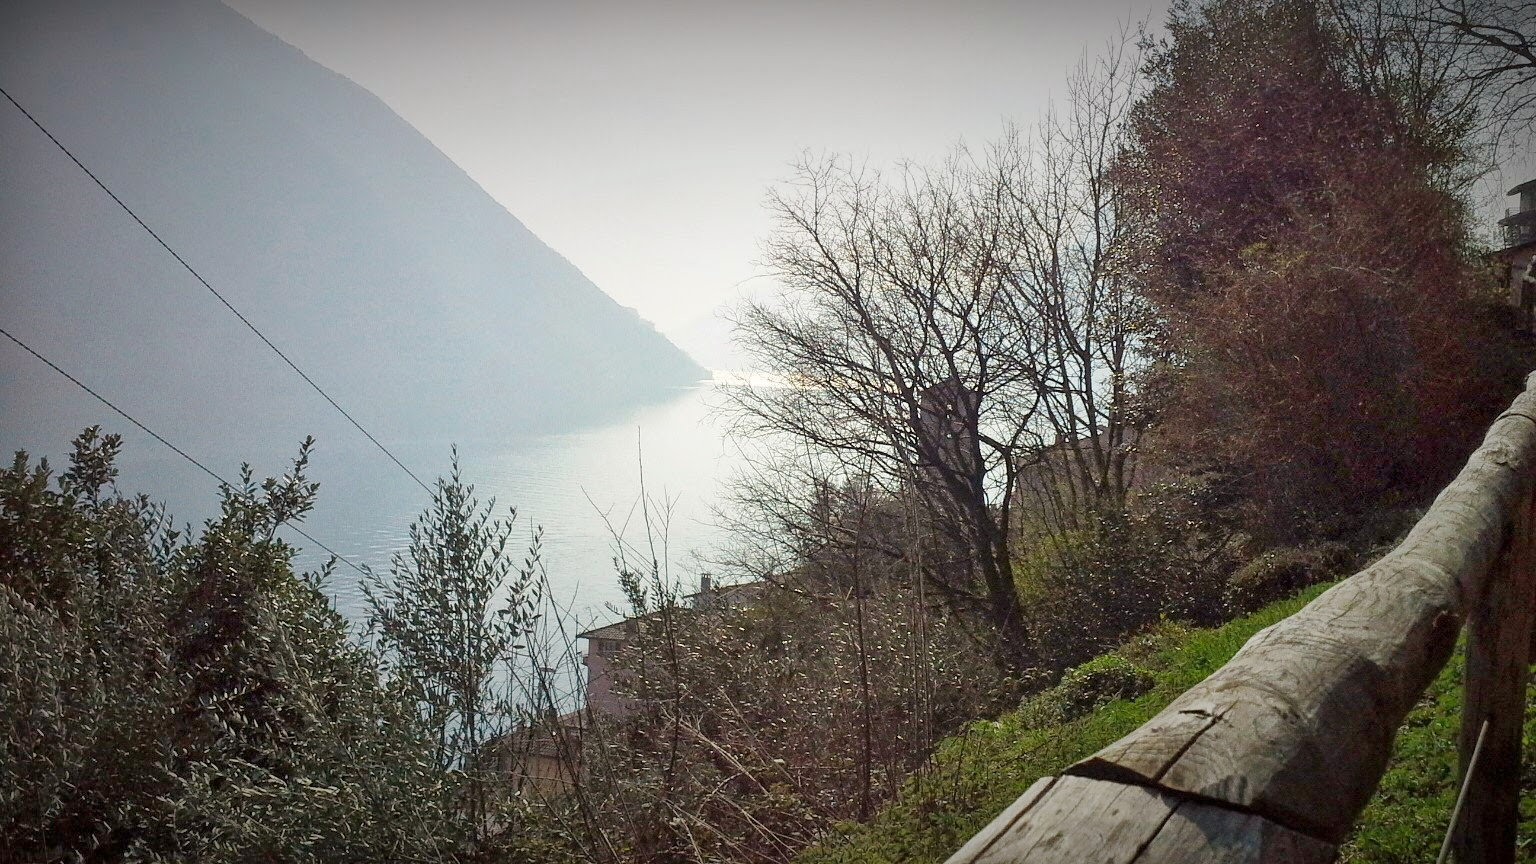 Gandria Ticino